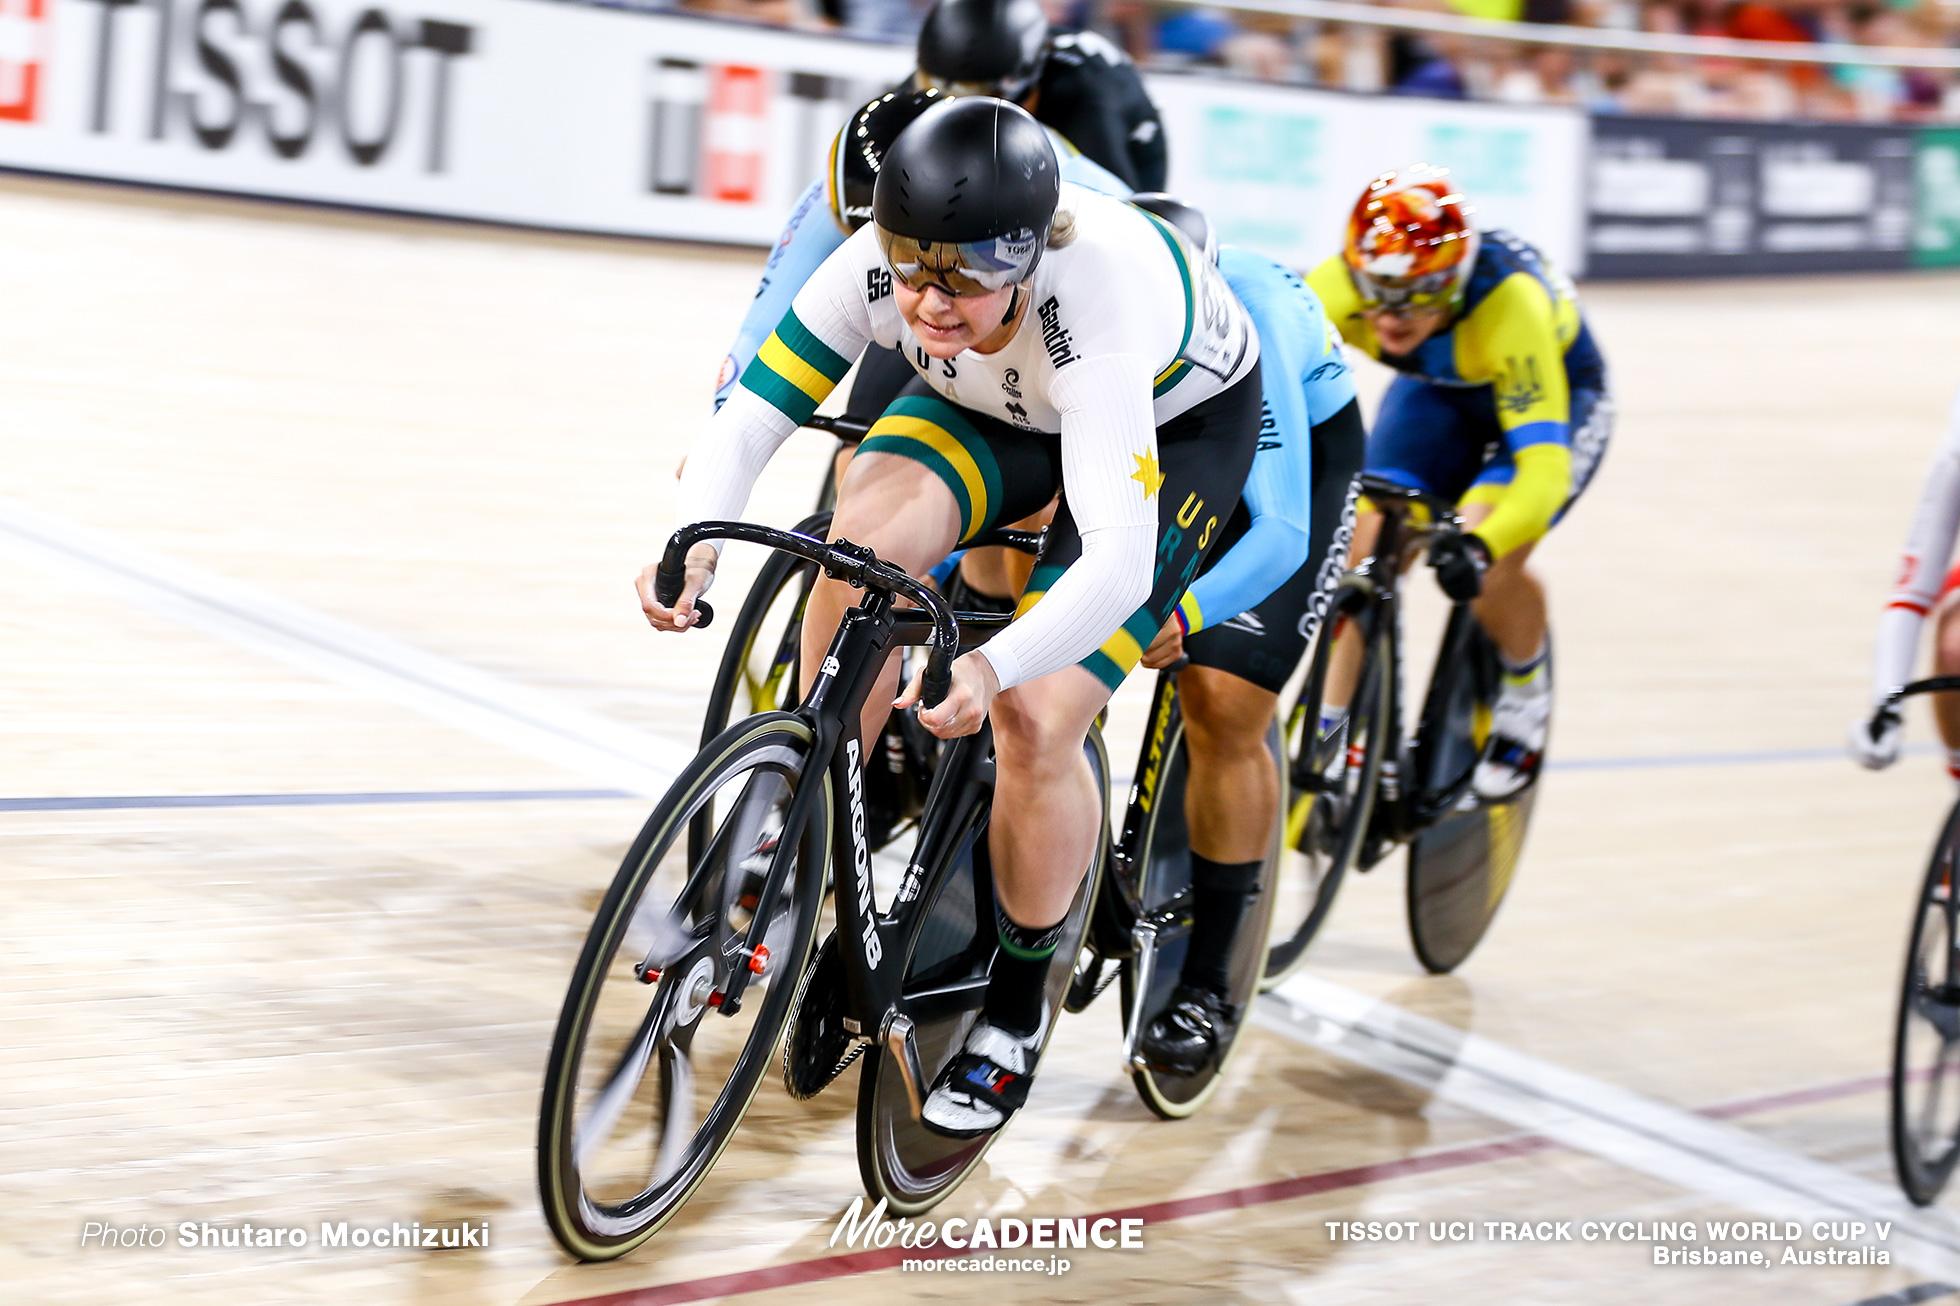 Final / Women's Keirin / TISSOT UCI TRACK CYCLING WORLD CUP V, Brisbane, Australia